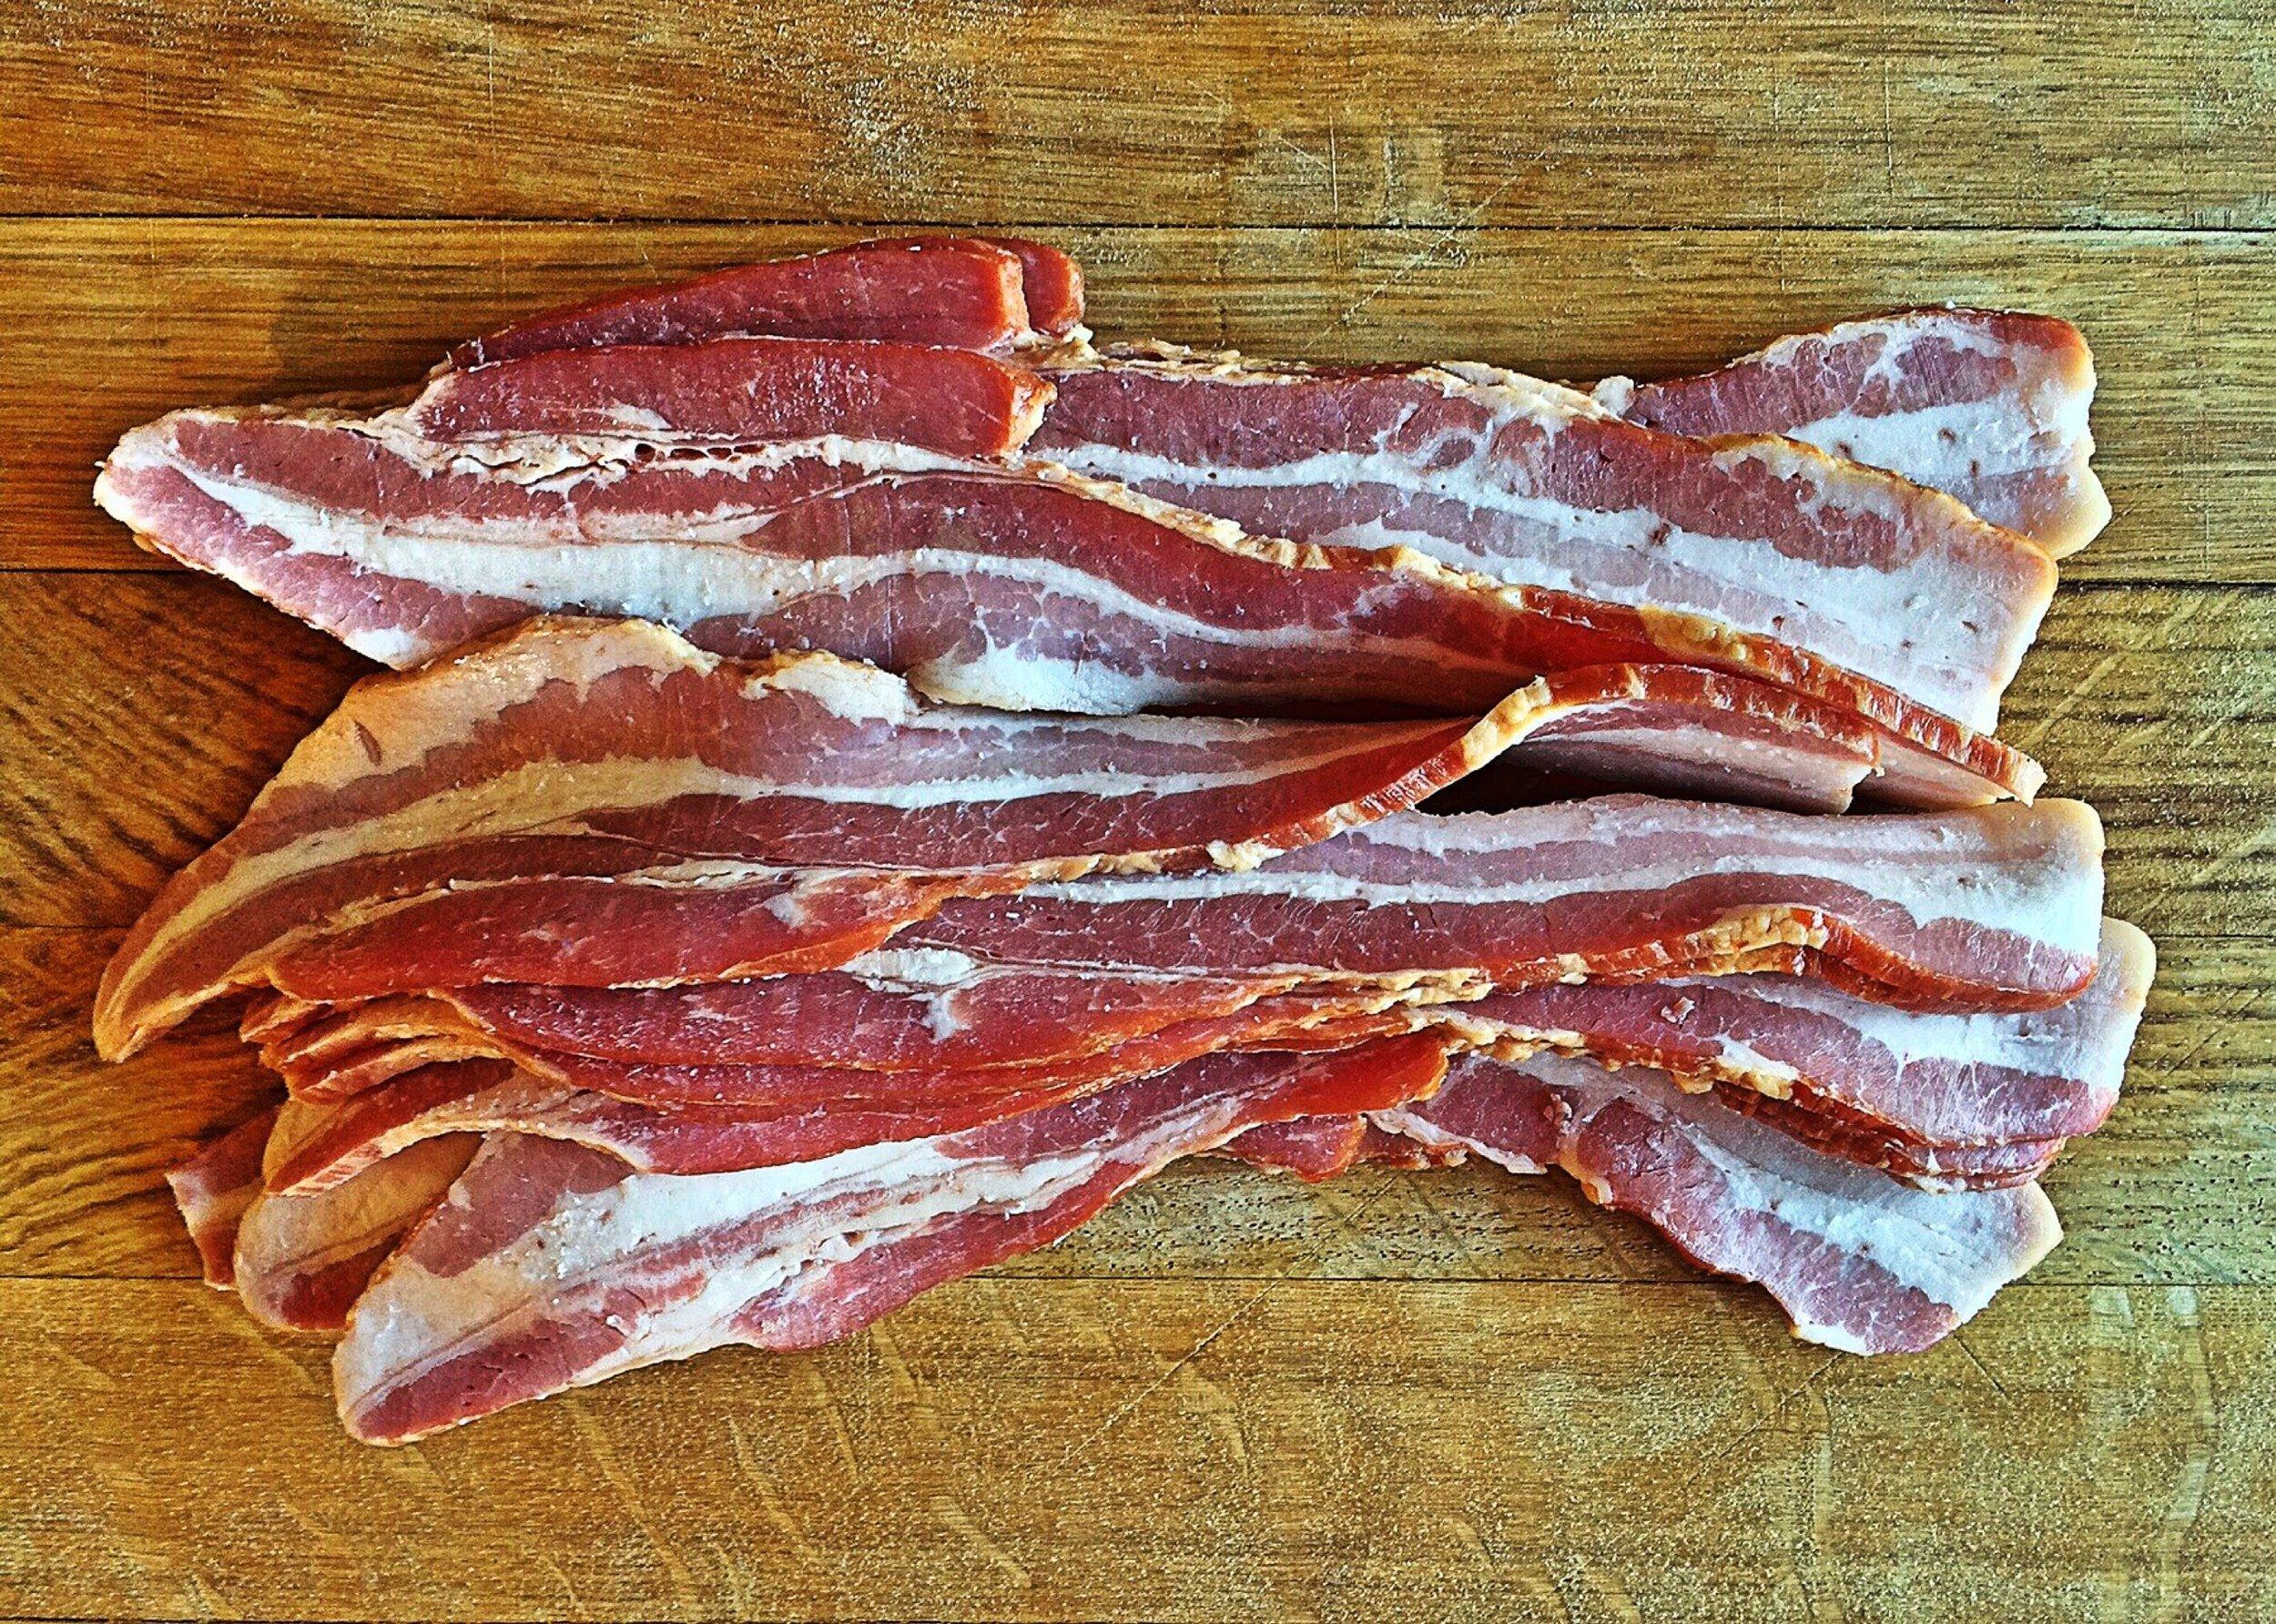 865 Candle Company - Bacon